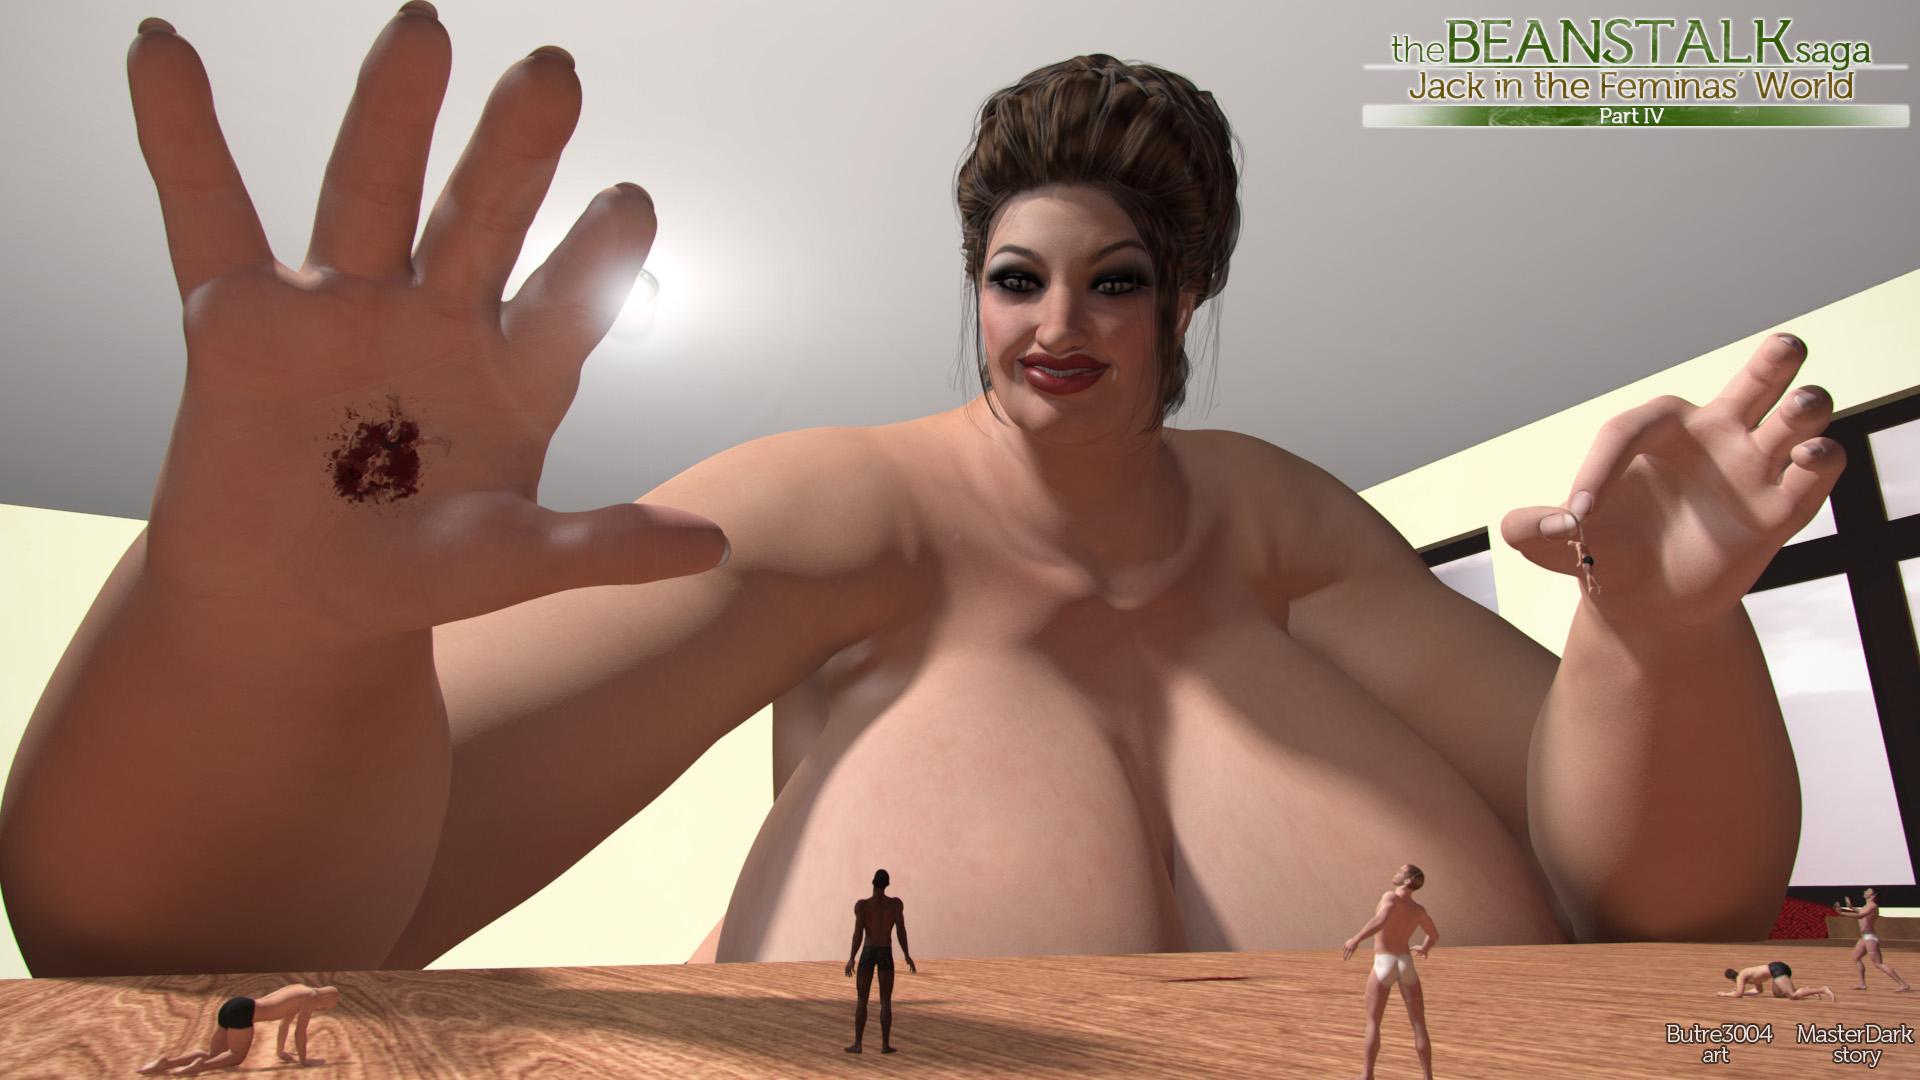 The Beanstalks saga- part 4 by butre3004